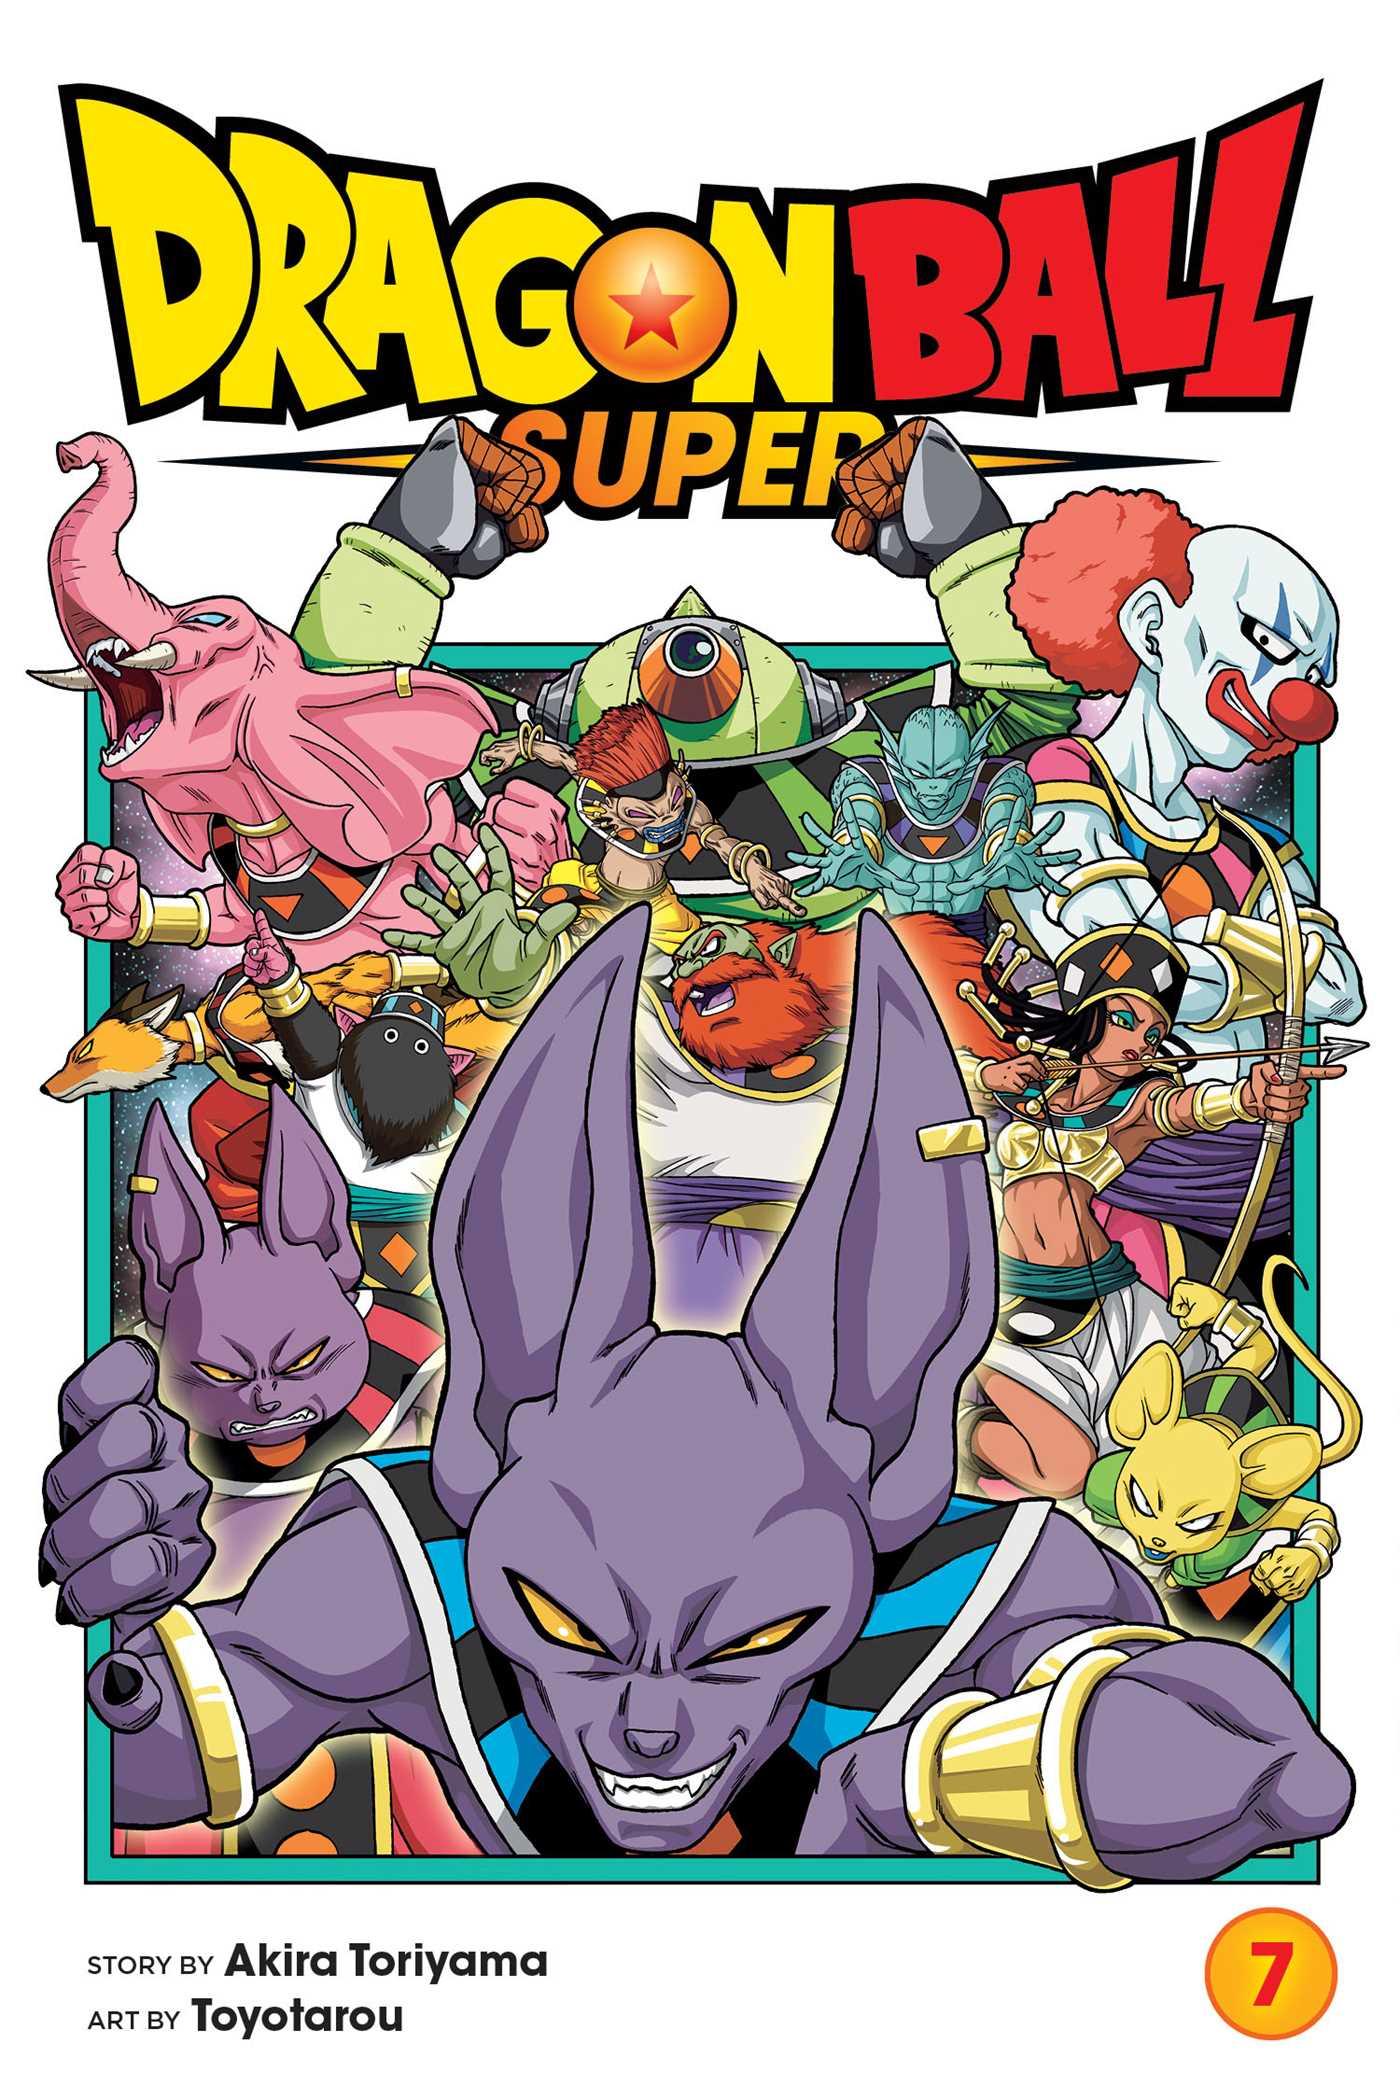 Dragon Ball Super, Vol. 7 by Akira Toriyama